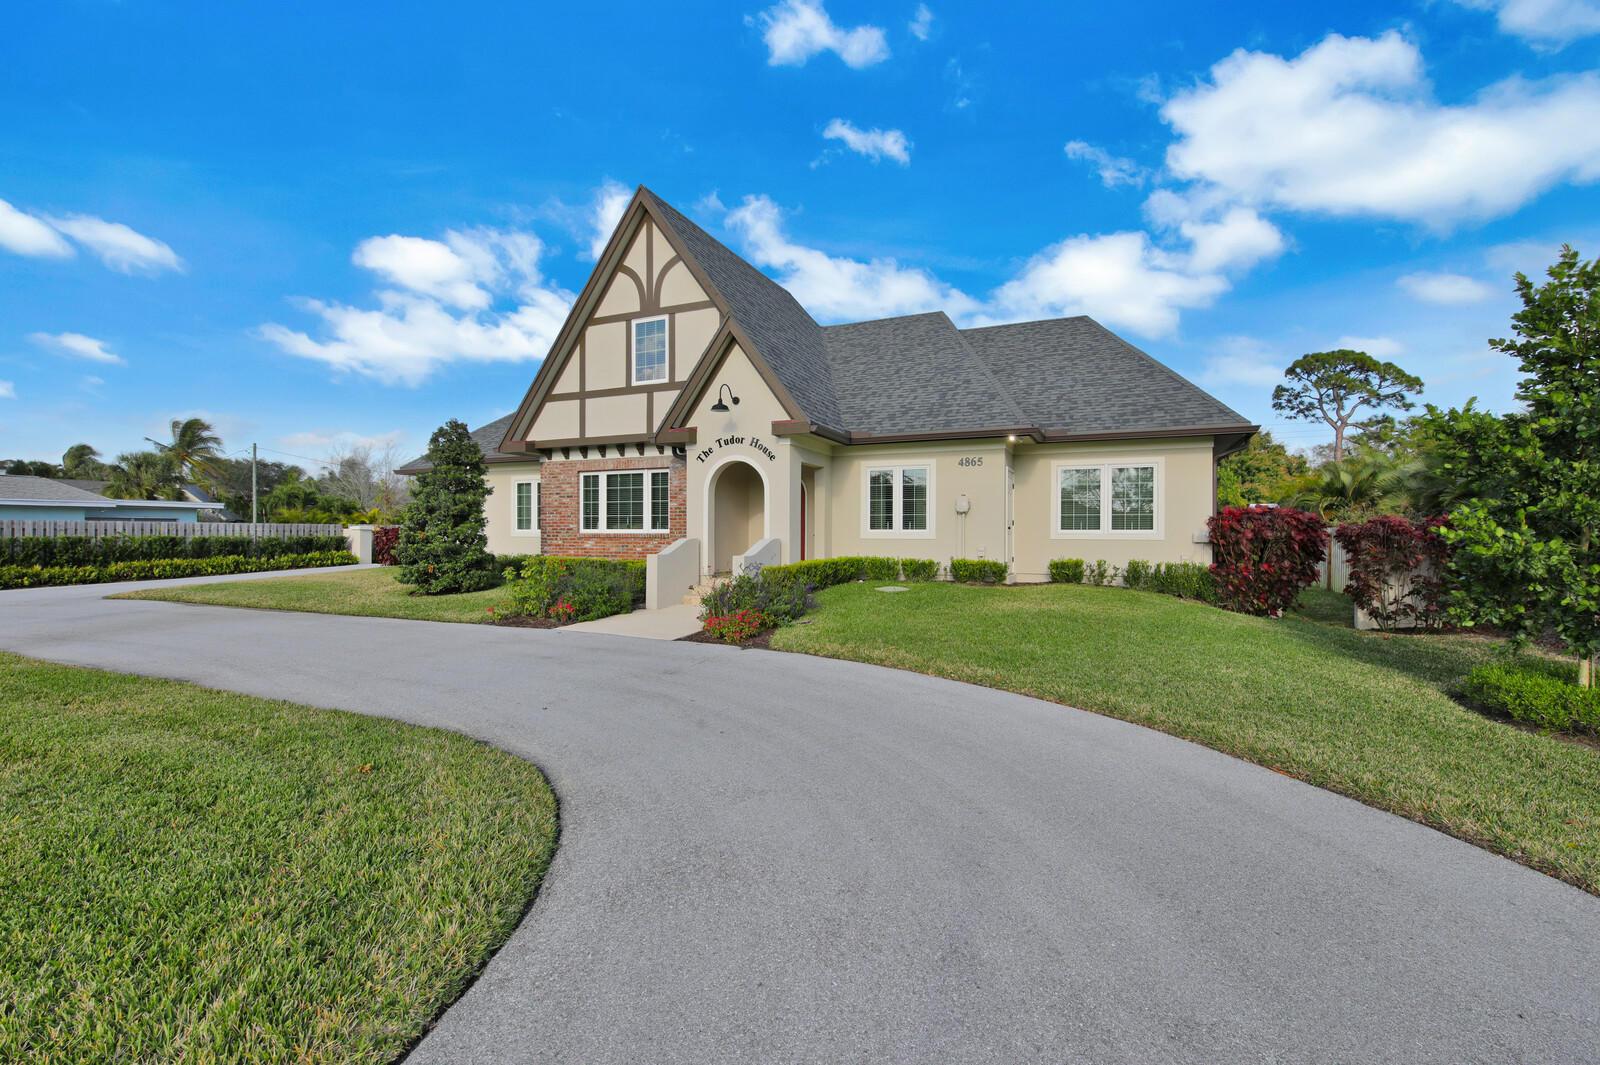 4865 SE Manatee Cove Road, Stuart, FL 34997